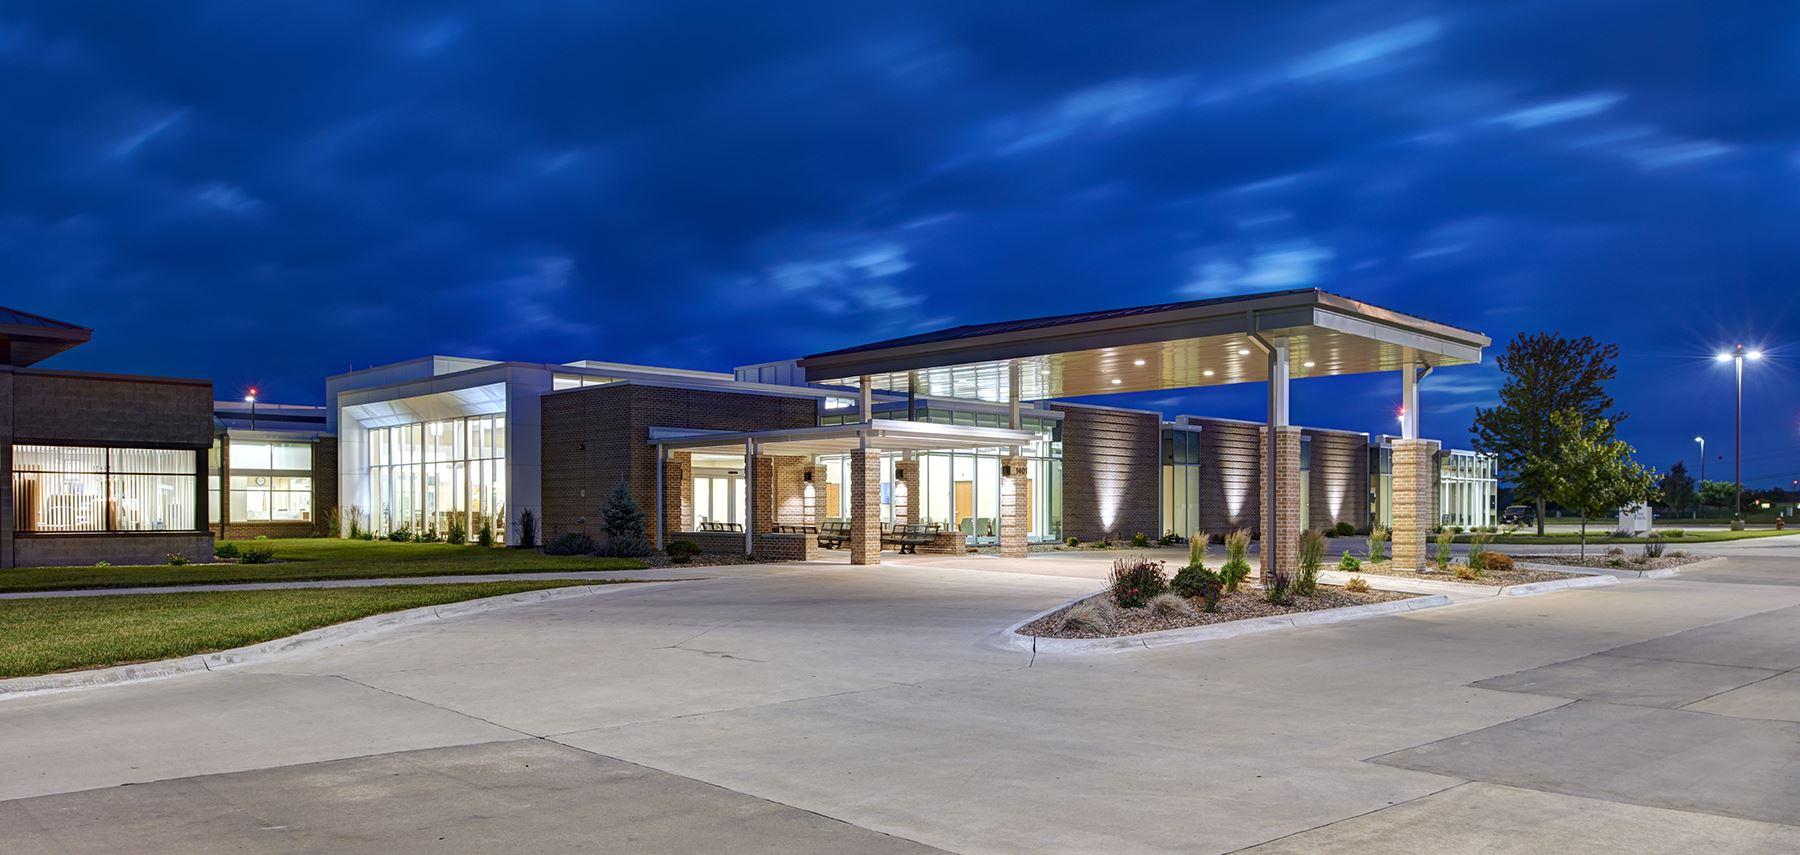 Award Of Merit With Distinction St Patrick Catholic Church Narthex Addition Cedar Falls Architect Ahts